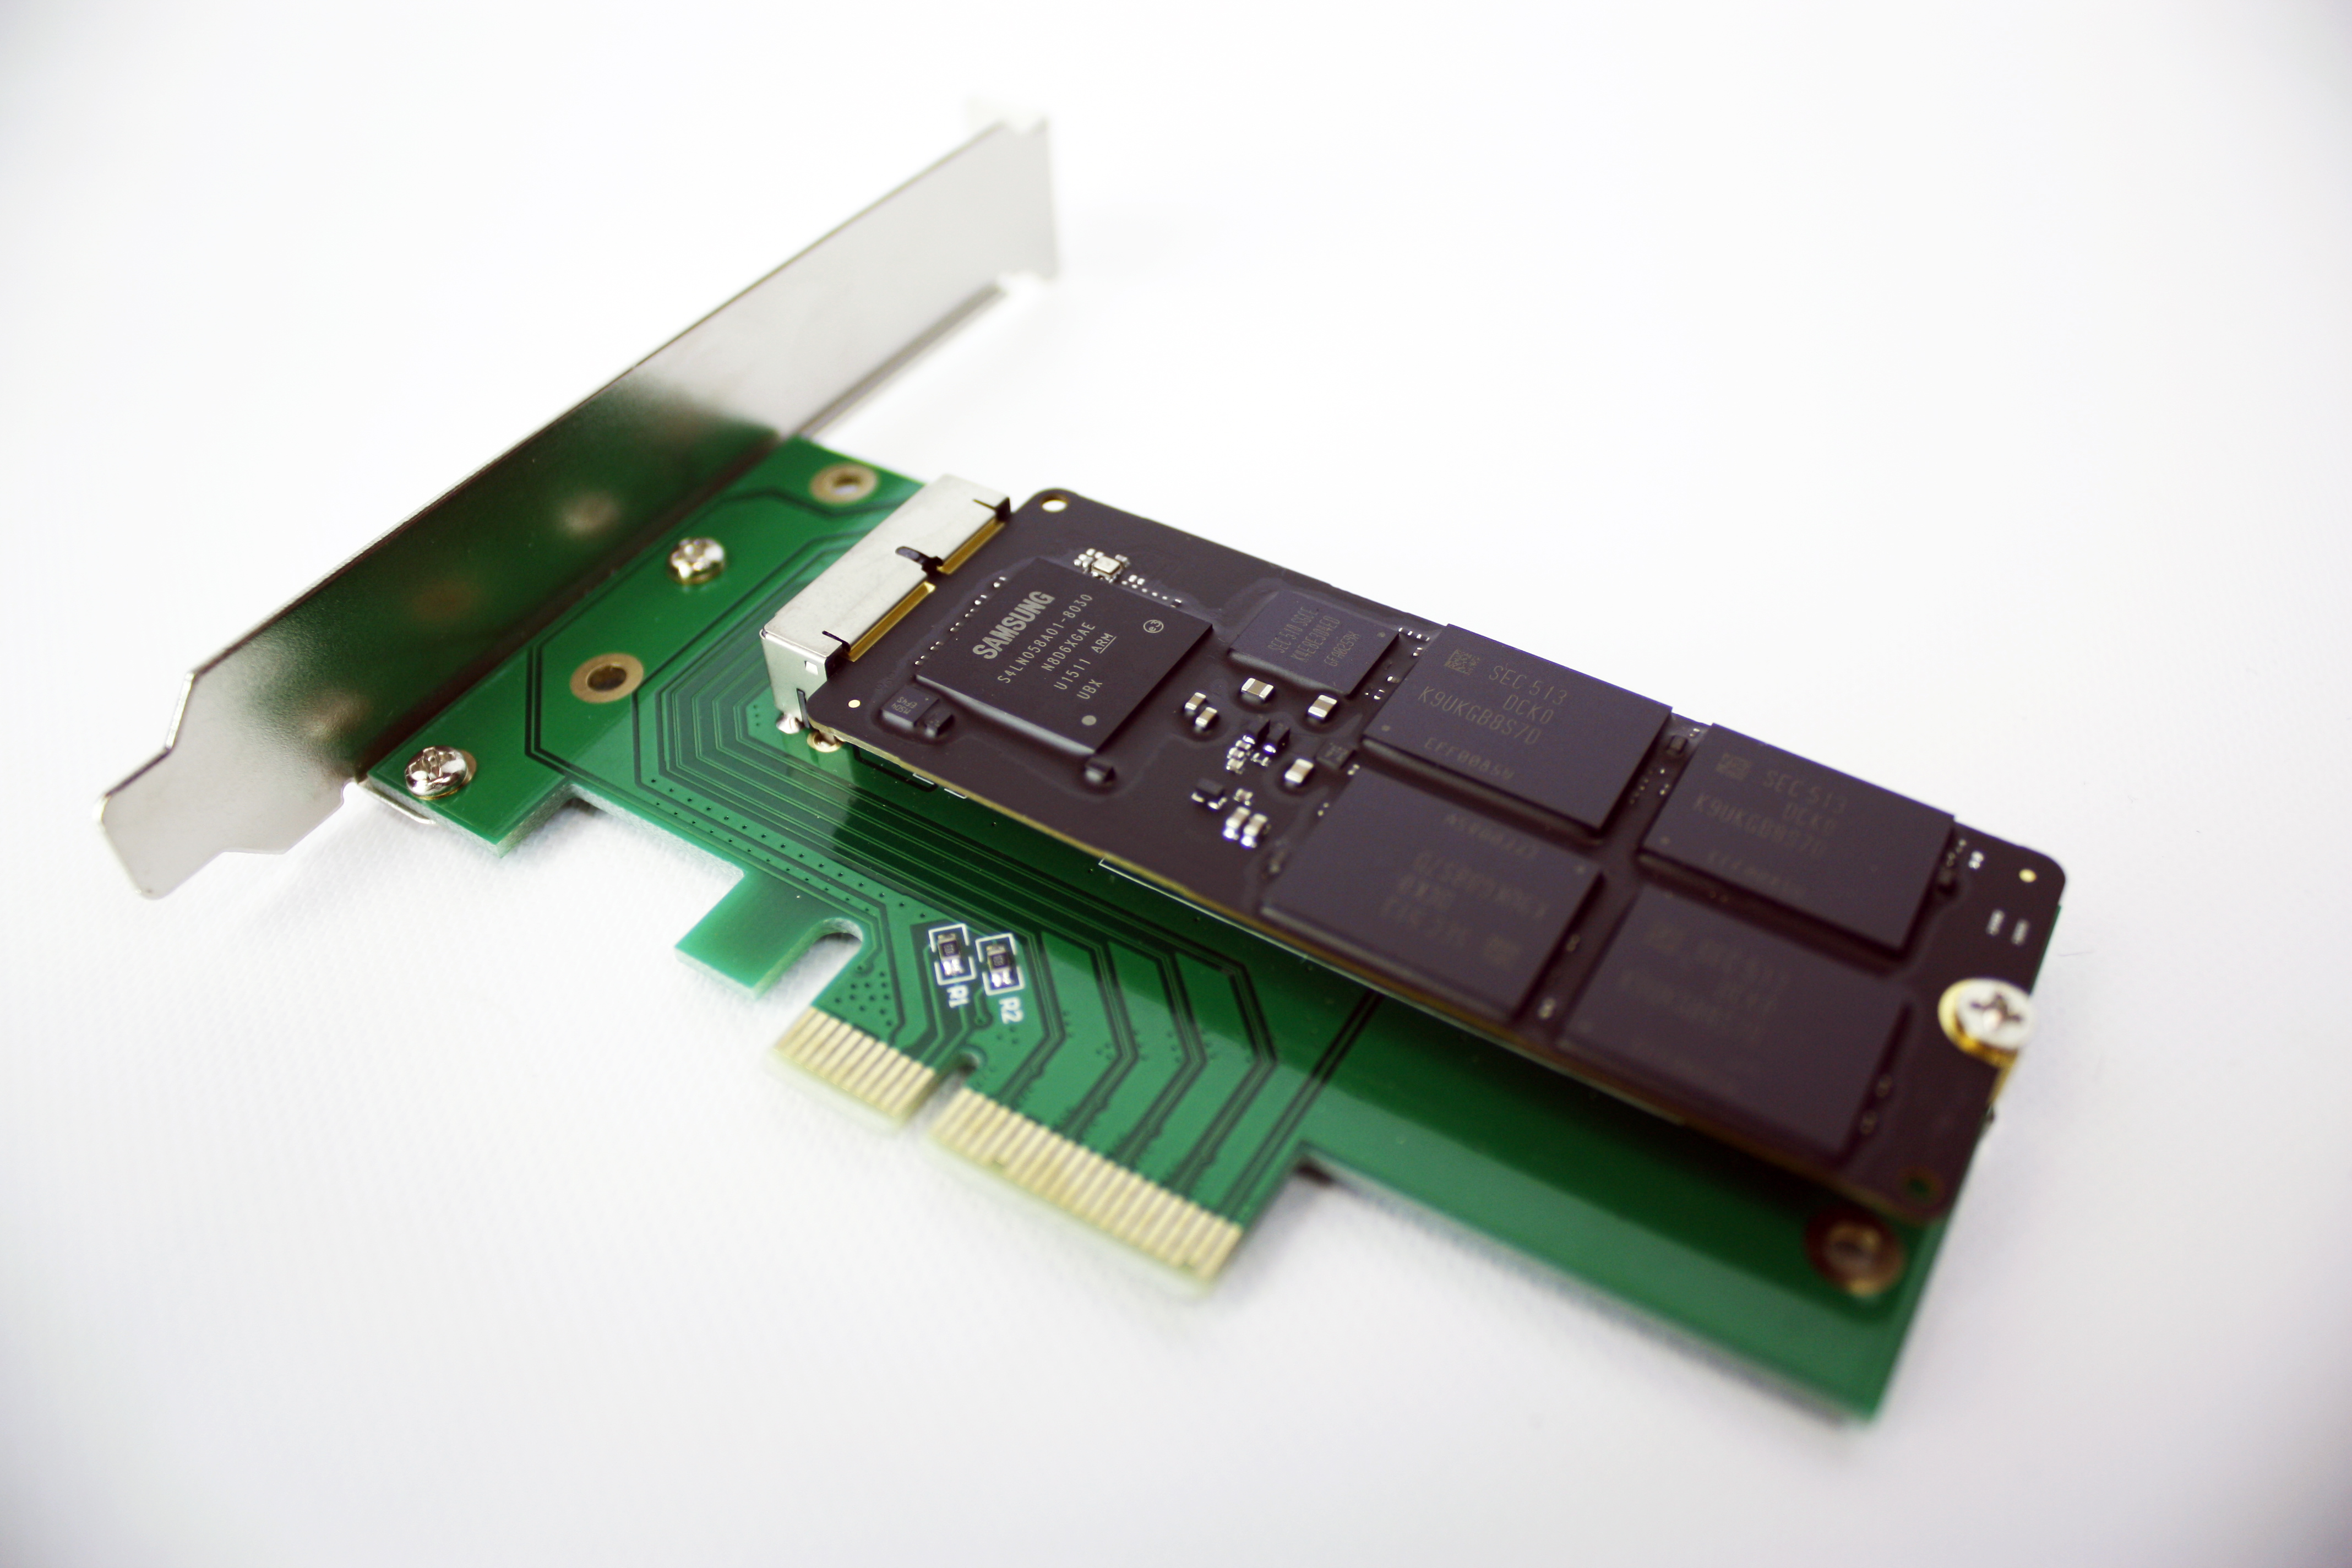 Create Pro offer 2015 Apple flash storage blades with native TRIM